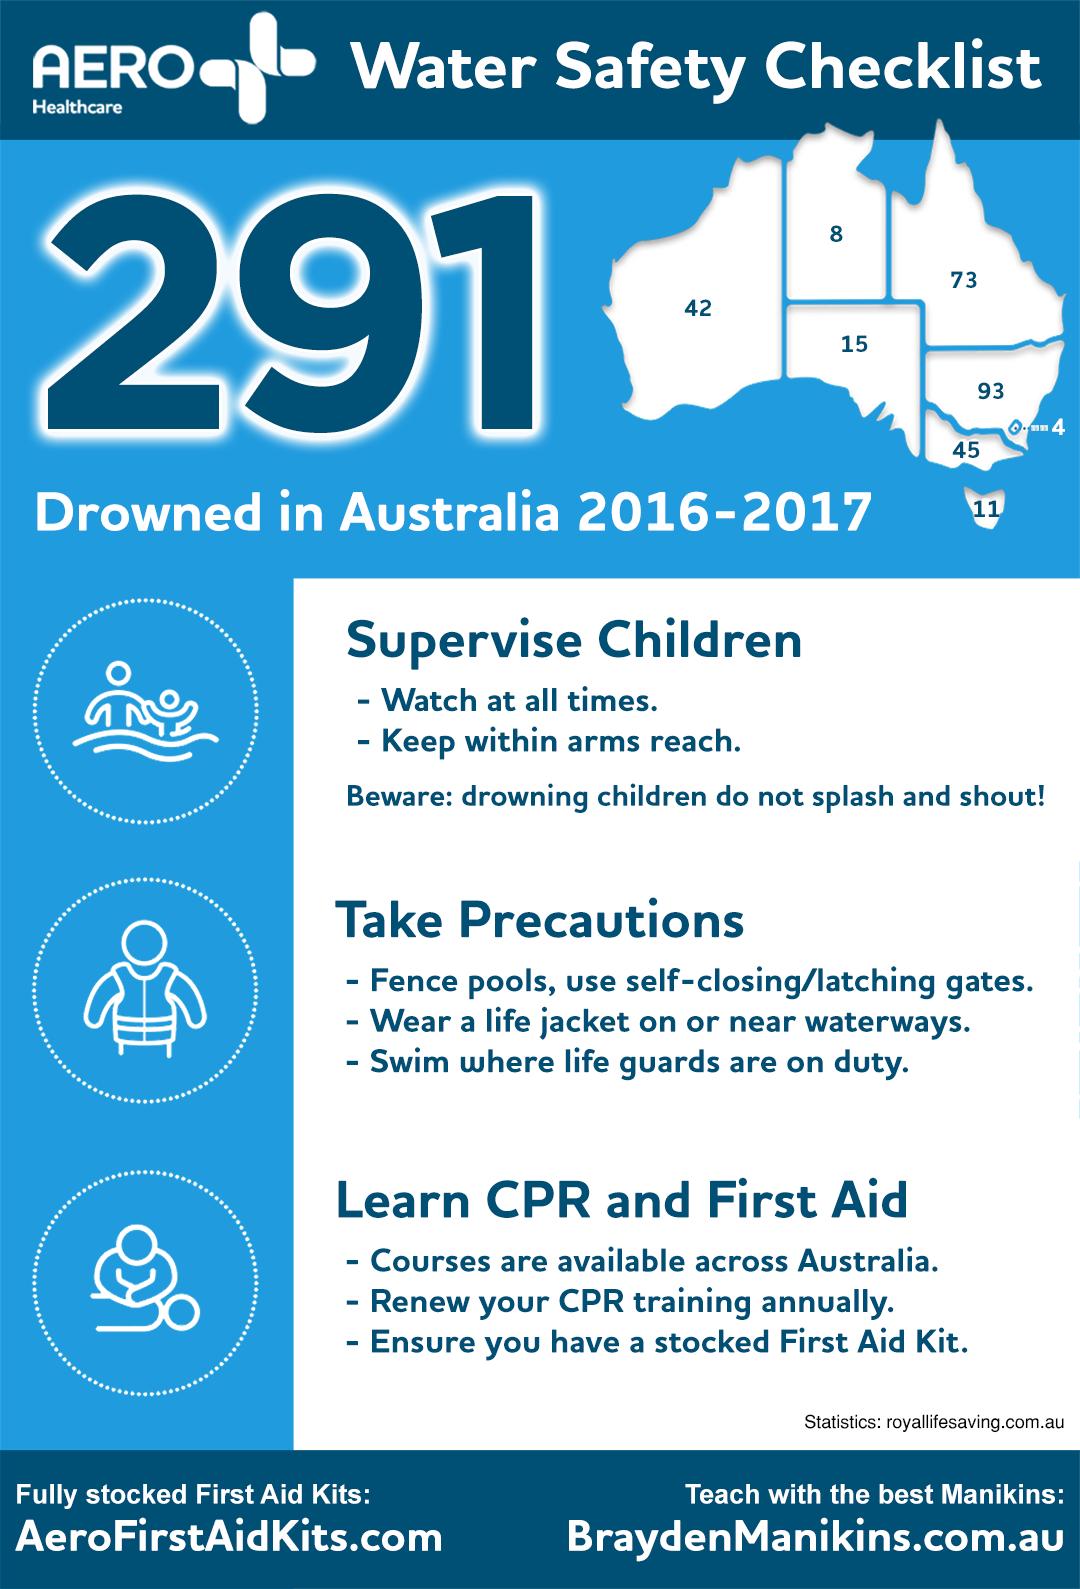 Water Safety Checklist & First Aid Kits Australia 2017